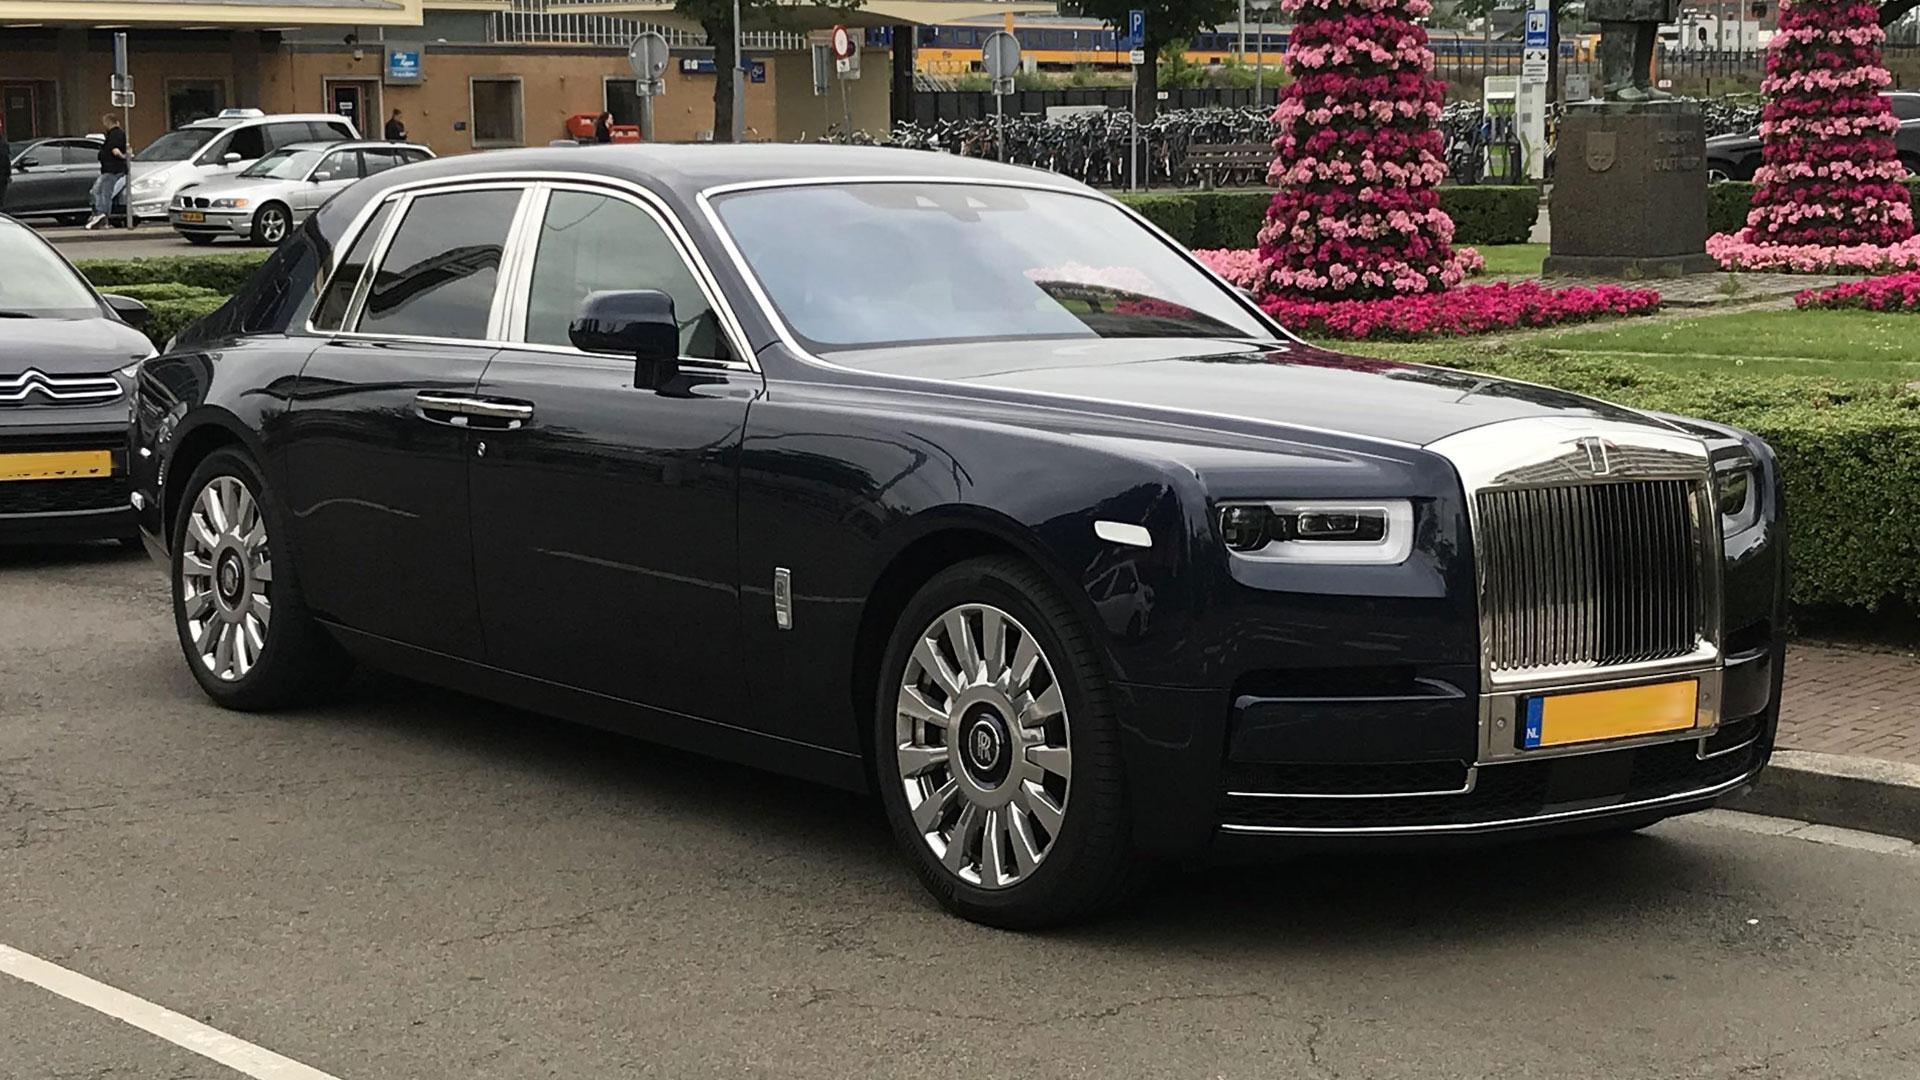 Duurste Rolls-Royce Phantom van NEderland in 2020